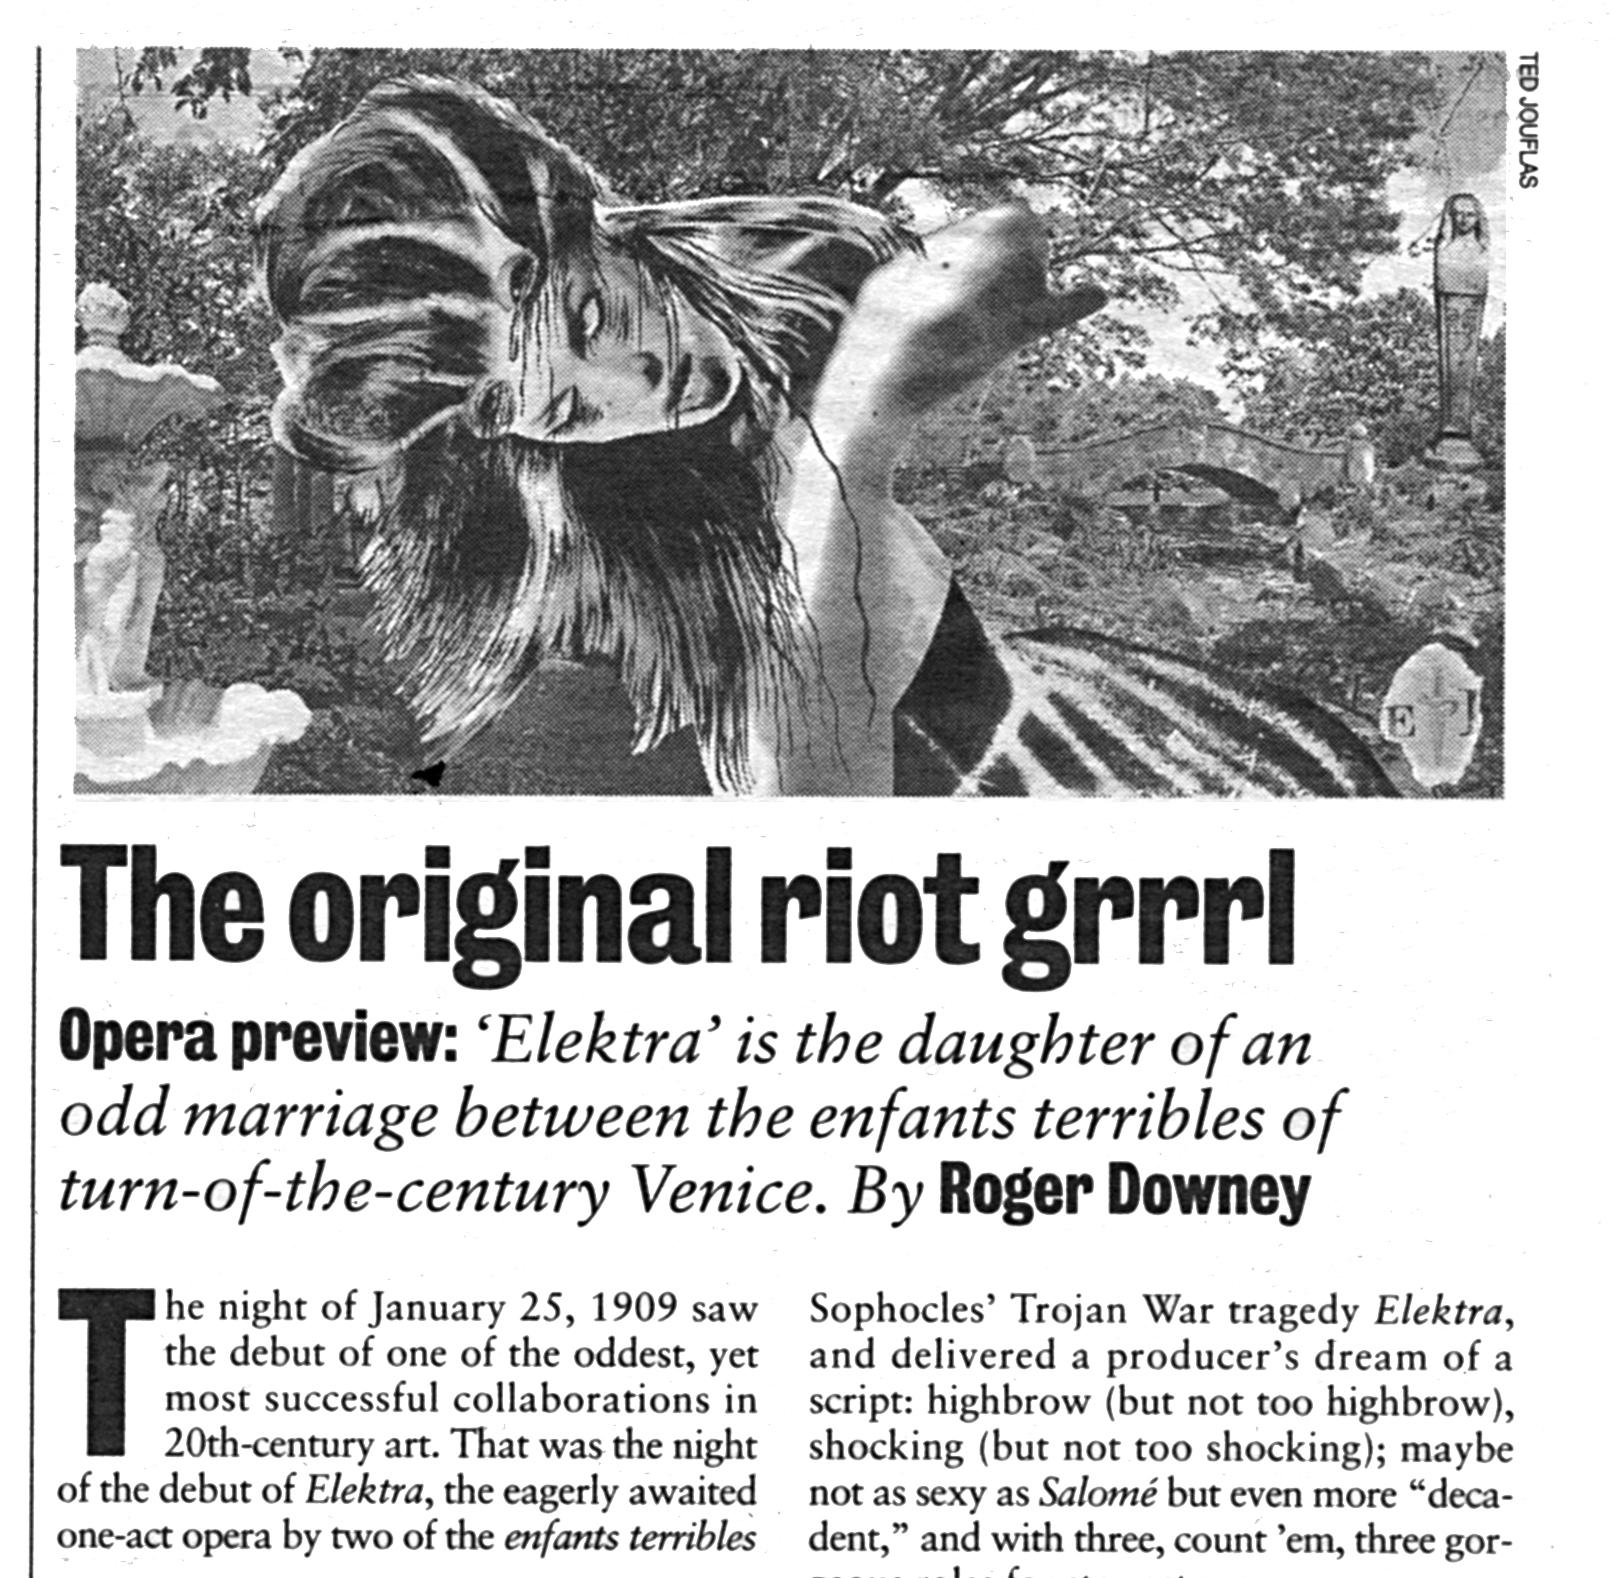 The Original Riot Grrrl - Seattle Weekly 1996